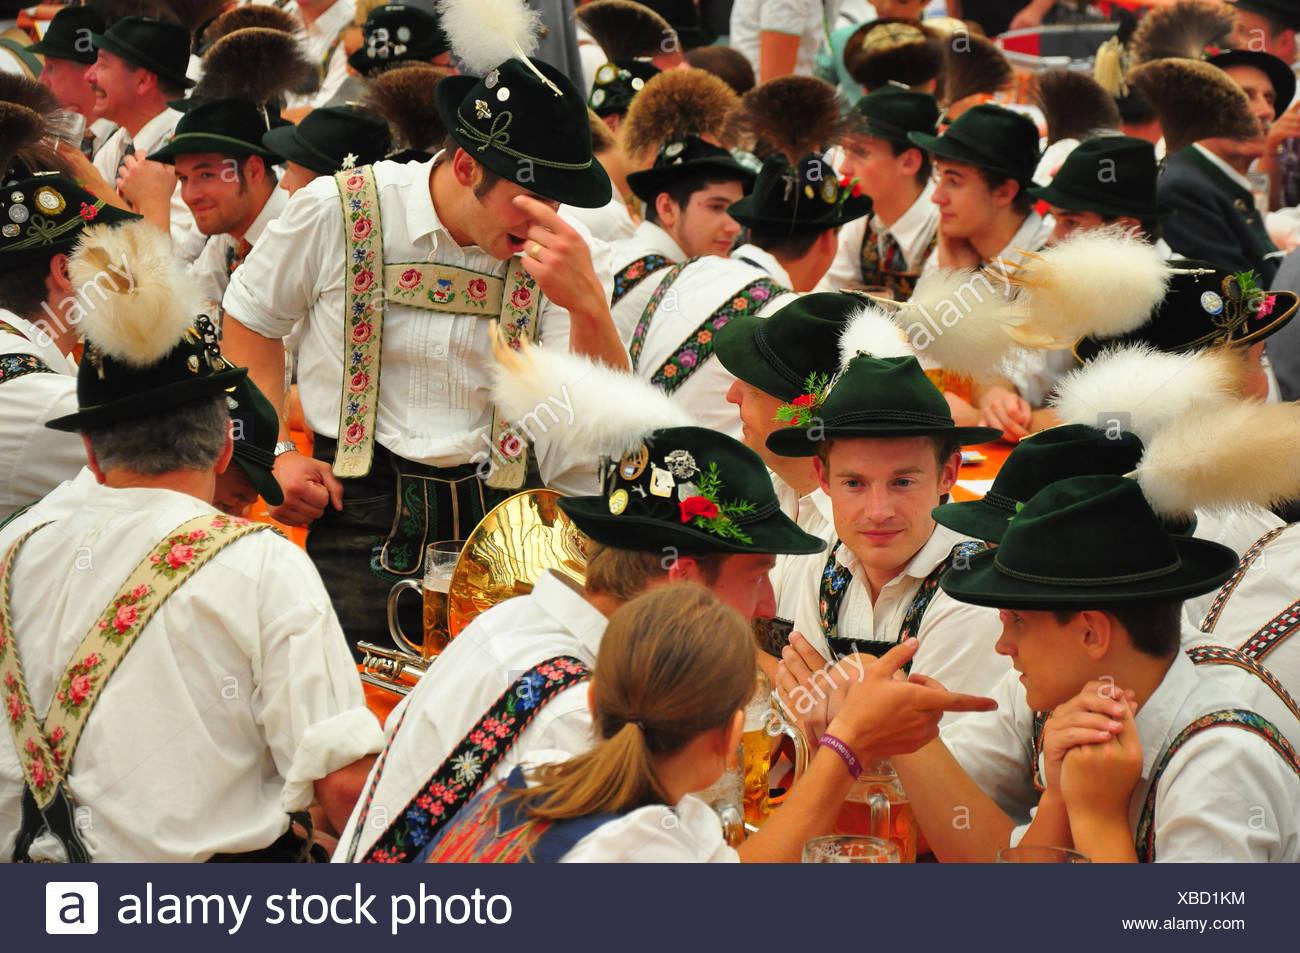 Germany, Bavaria, Garmisch-Partenkirchen, festival, beer tent, Trachtler, - Stock Image